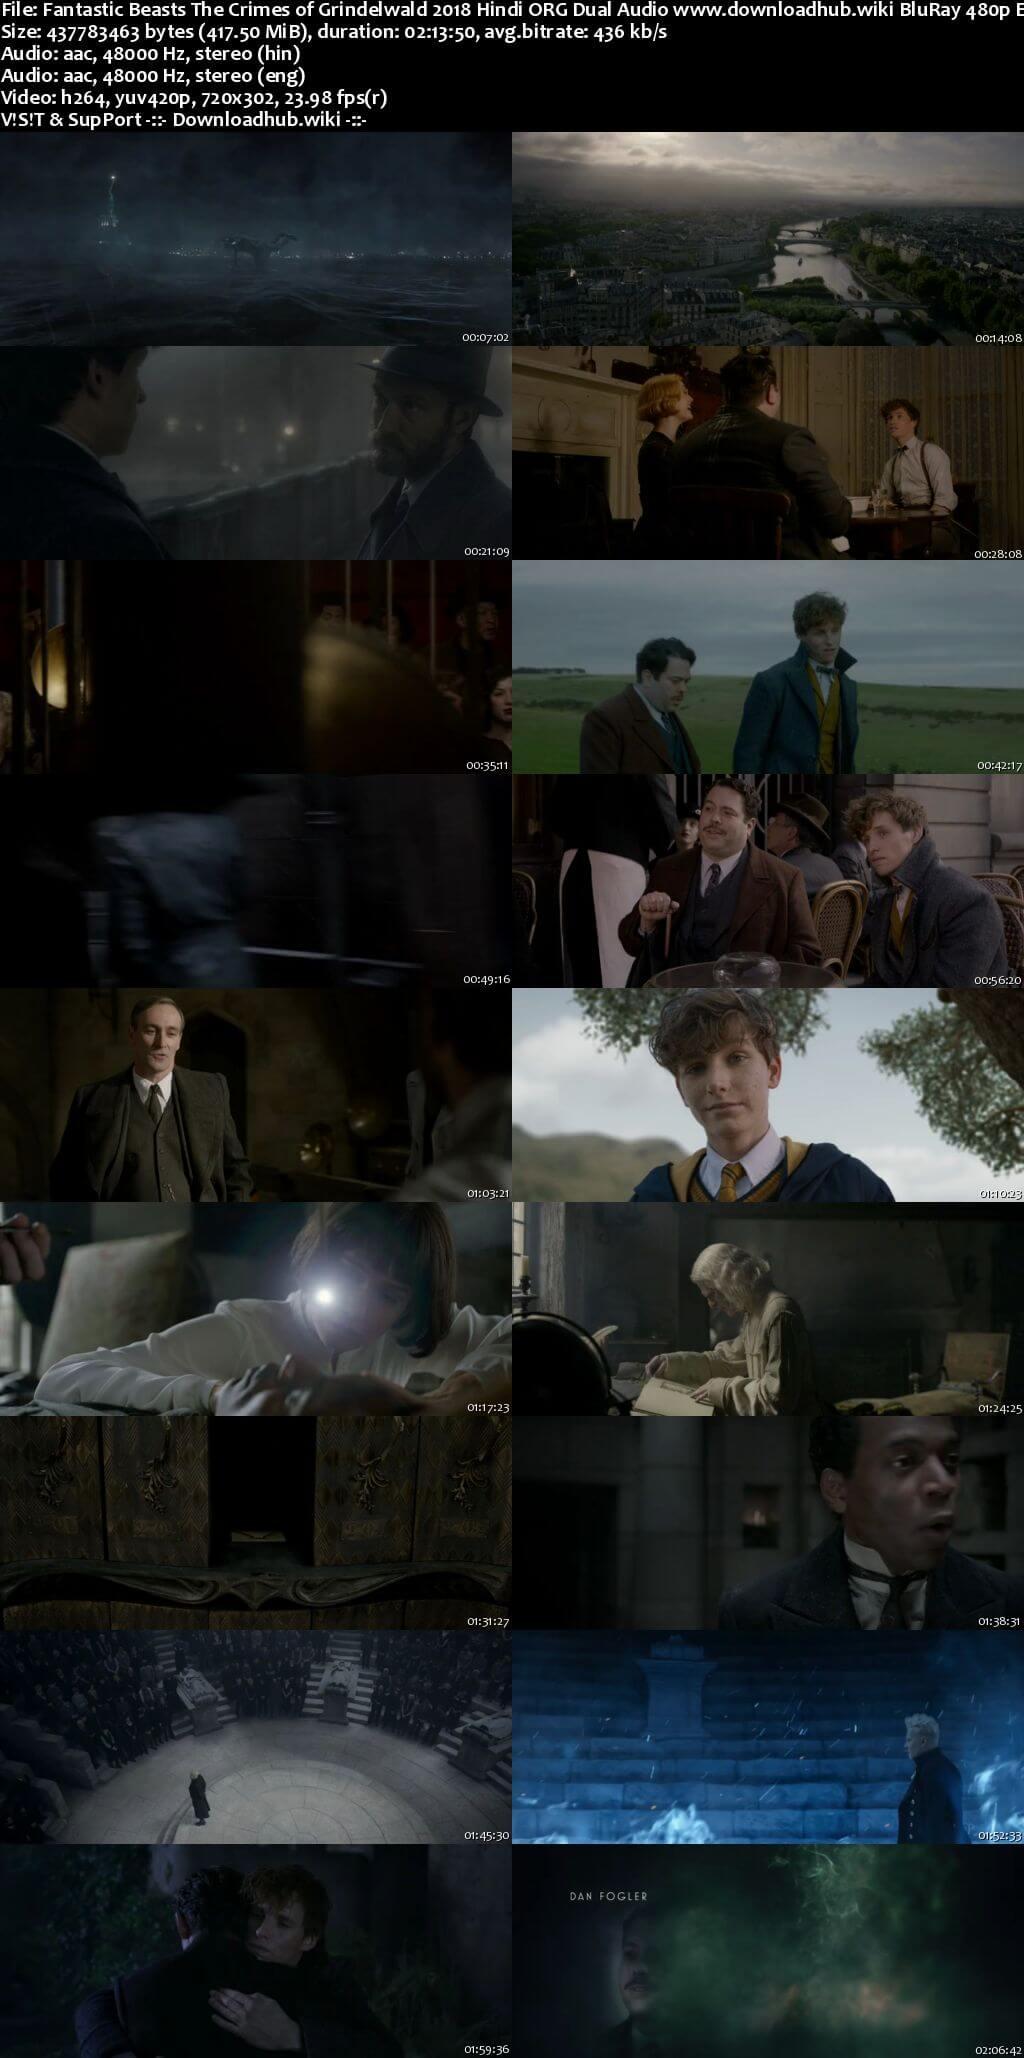 Fantastic Beasts The Crimes of Grindelwald 2018 Hindi ORG Dual Audio 400MB BluRay 480p ESubs